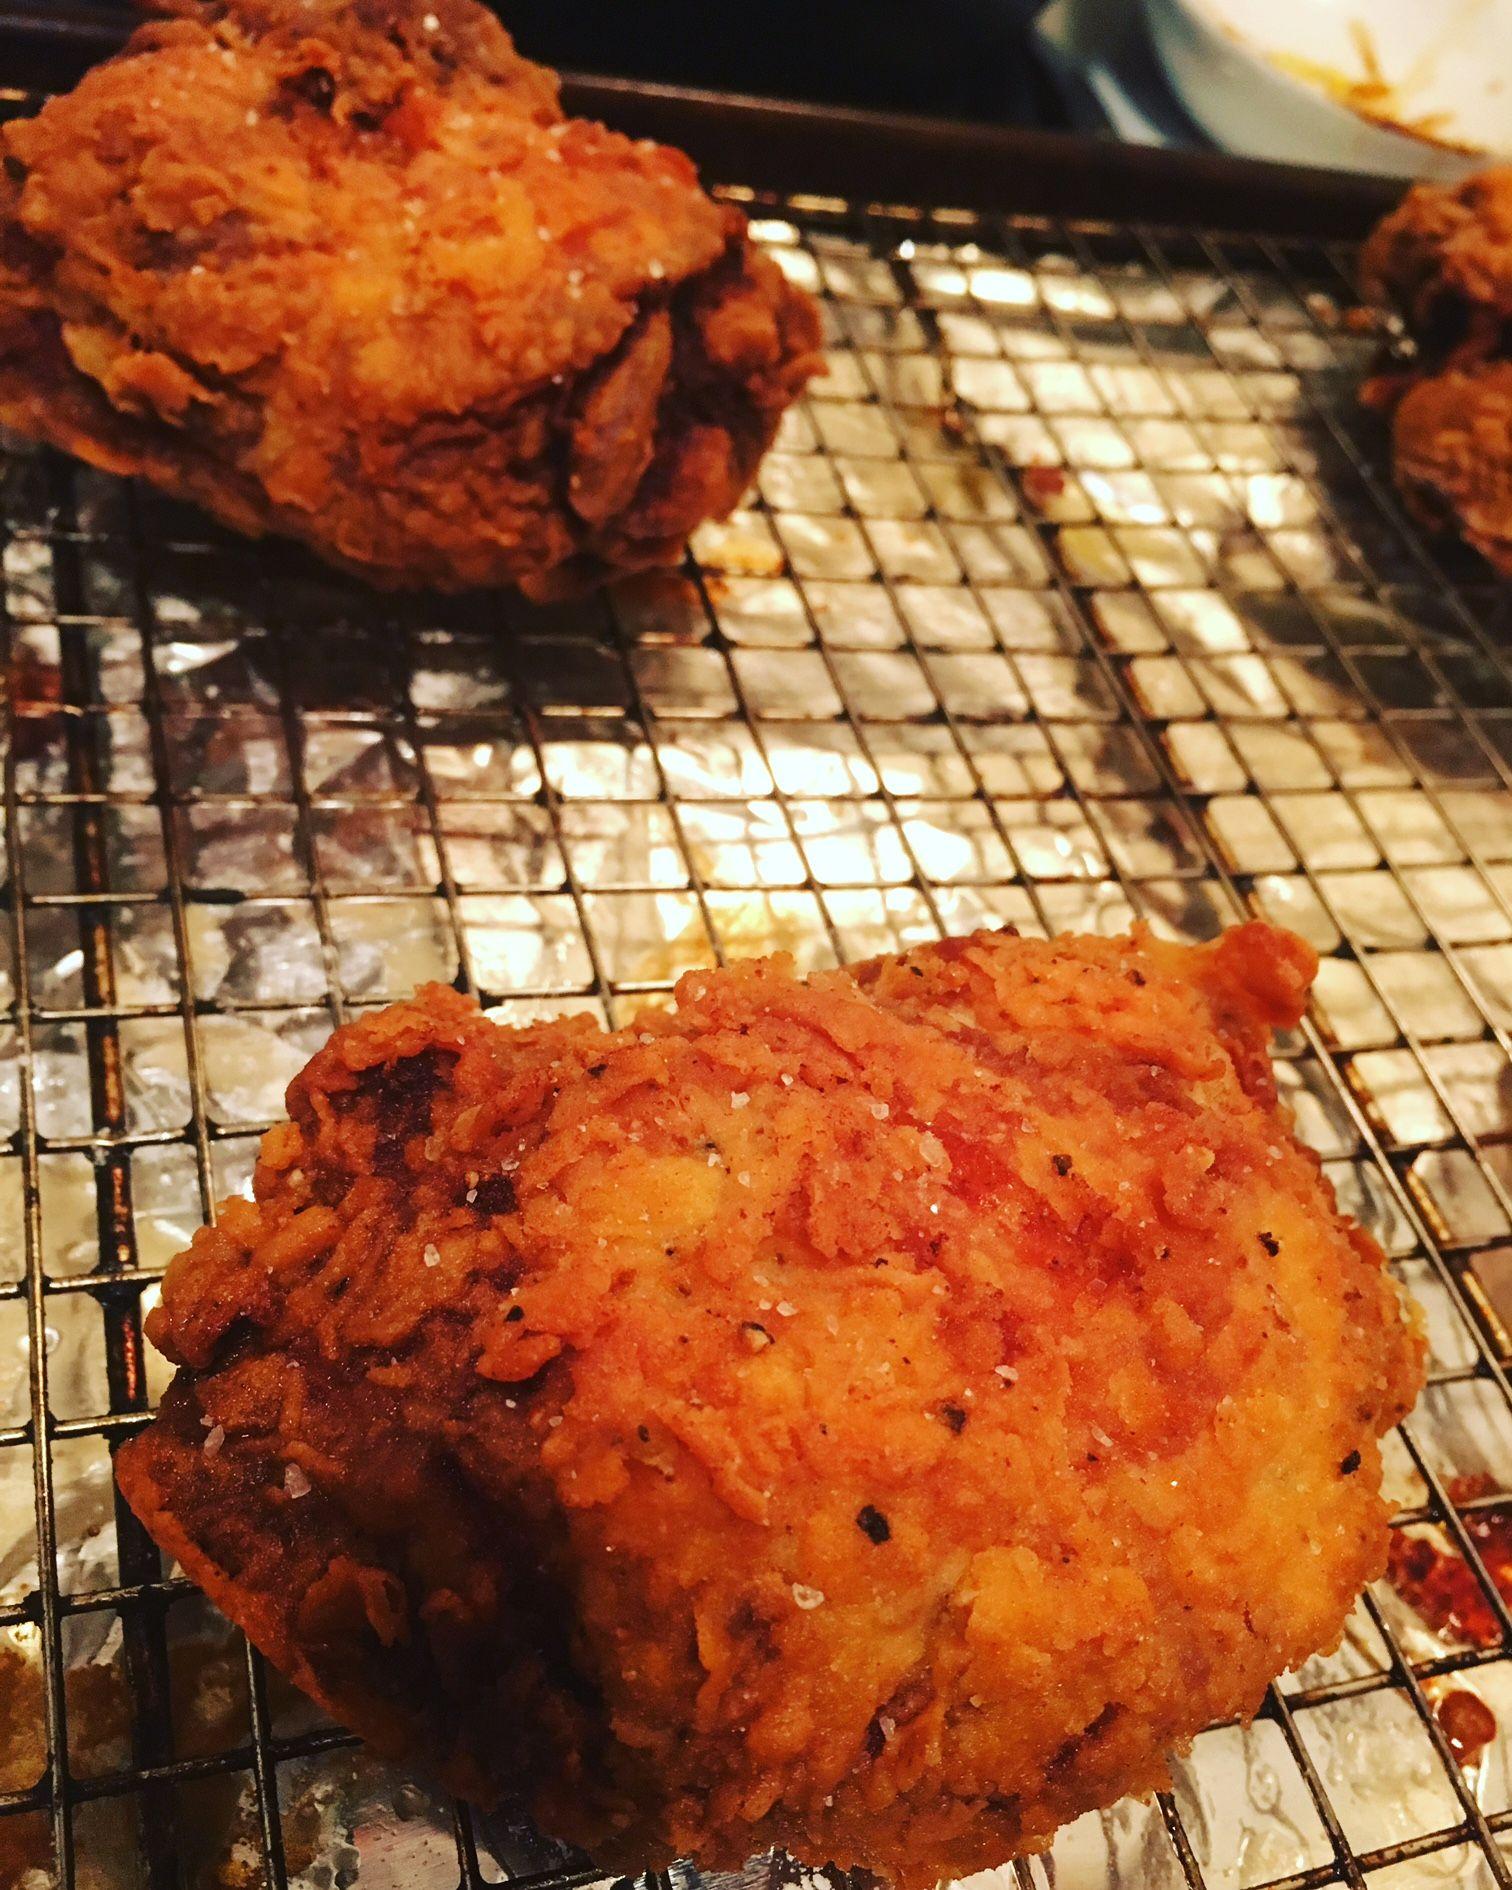 Pickle-Fried Chicken | Recipe in 2020 | Fried chicken, Fried chicken recipes, Cooking recipes